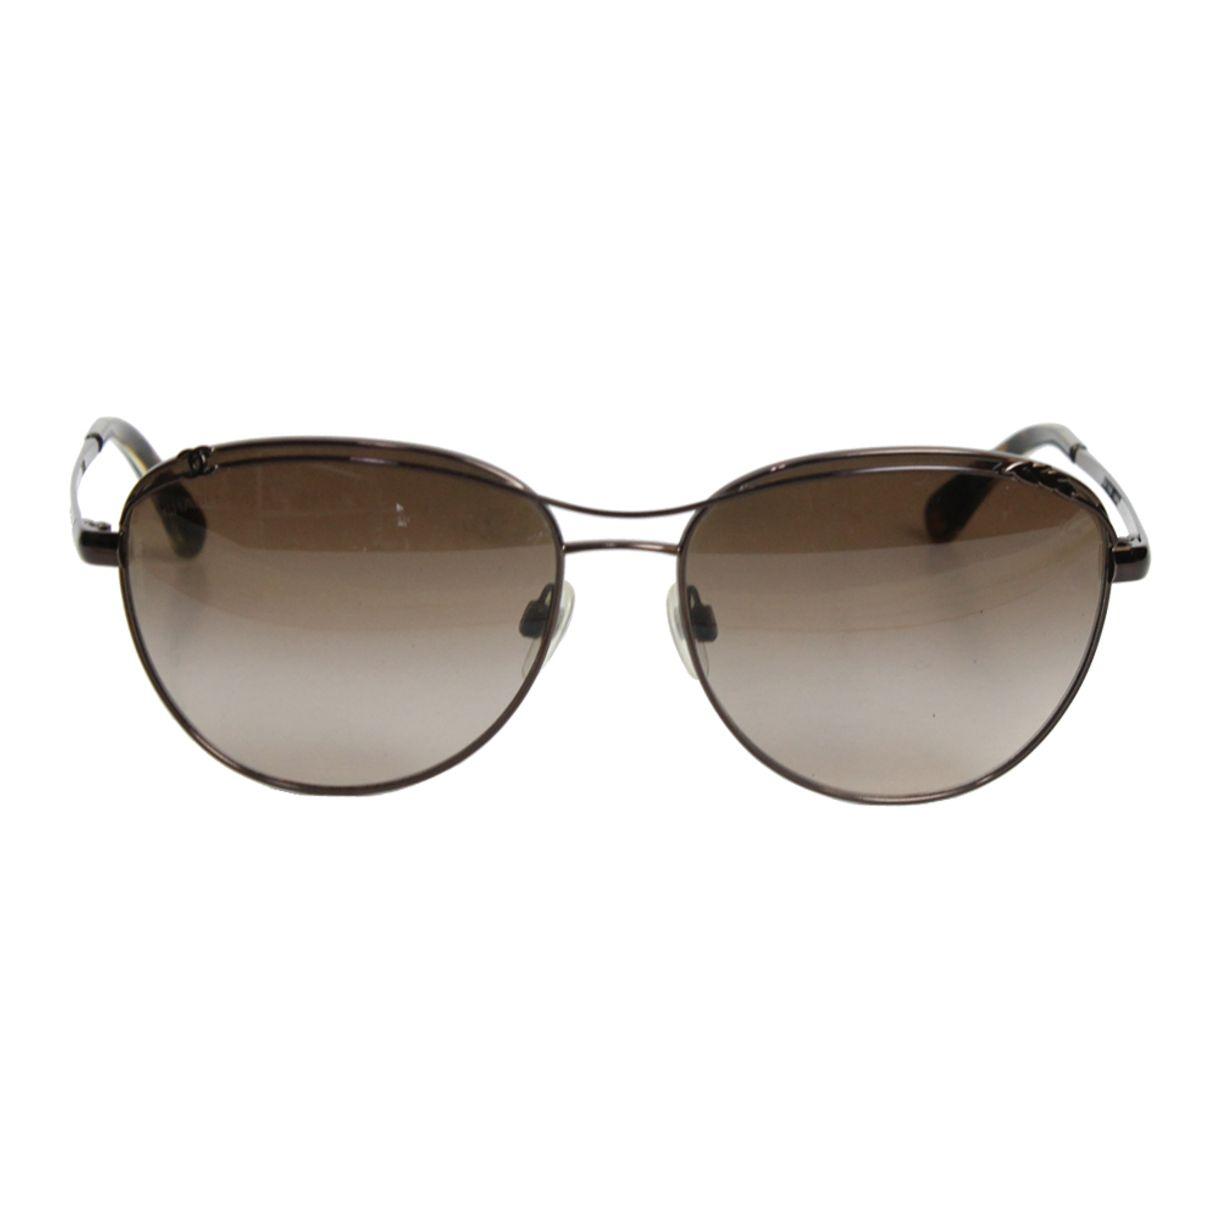 Oculos-Chanel-Metal-Marrom